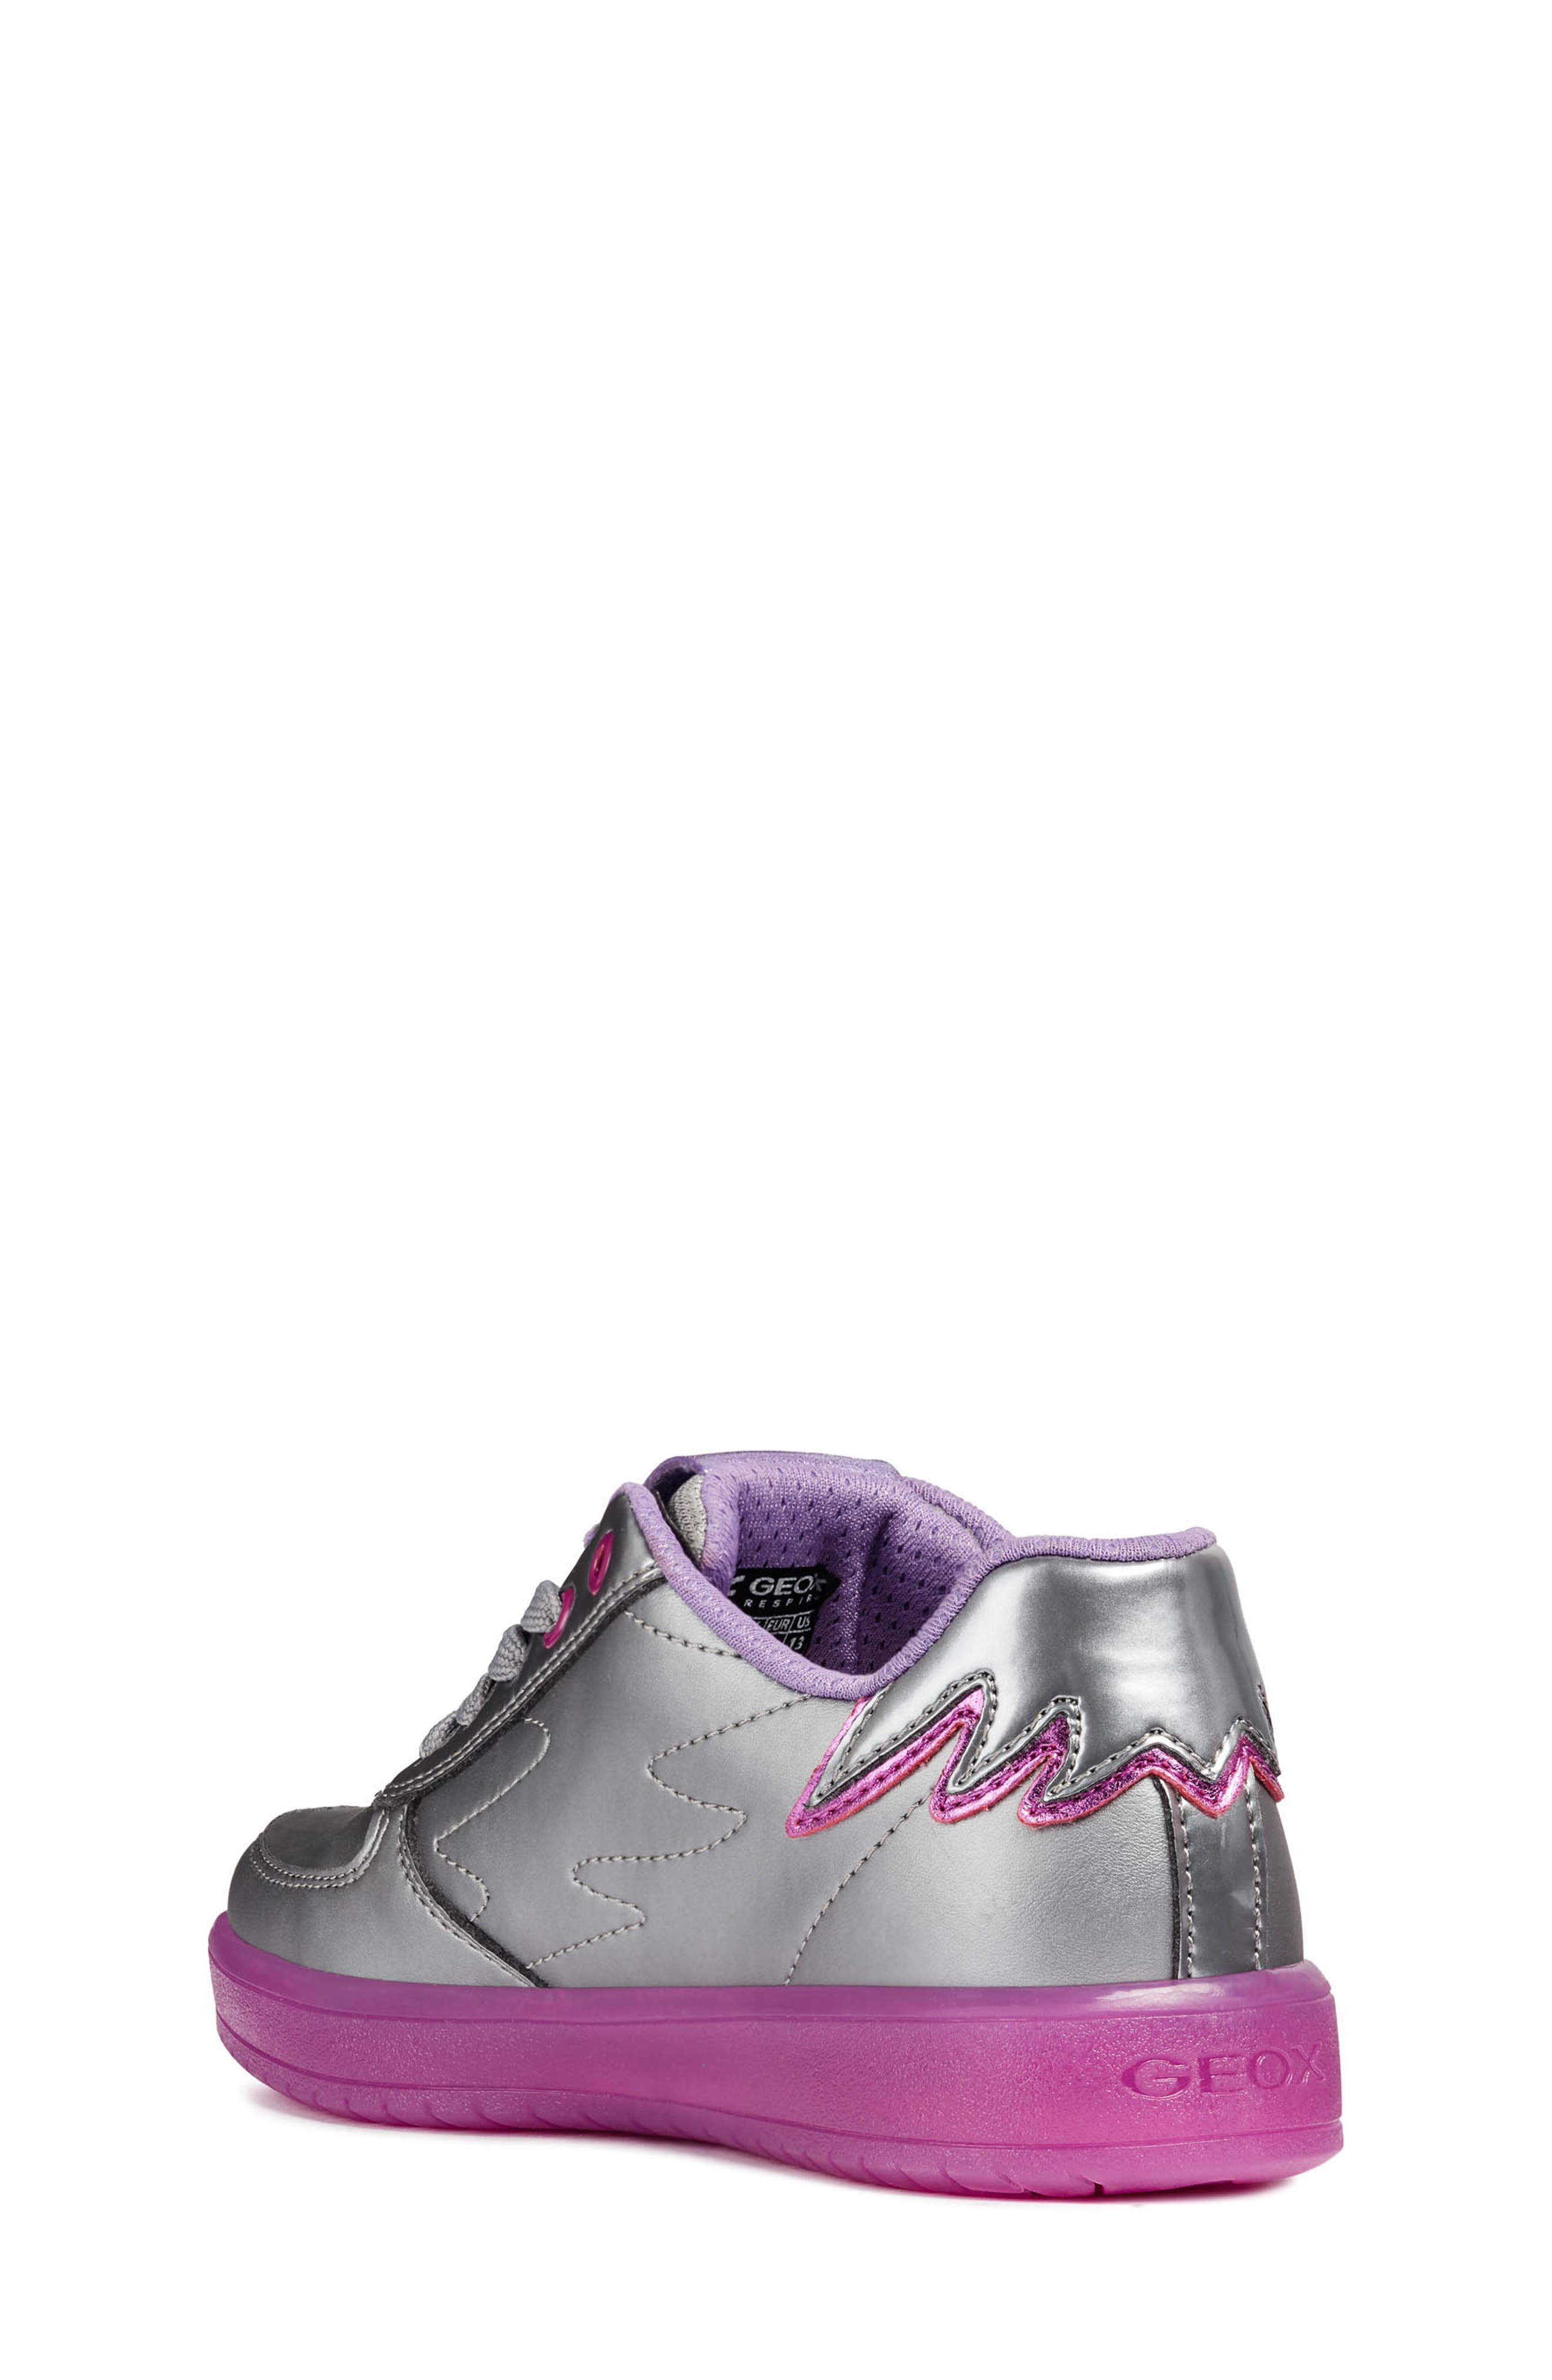 Kommodor Glitter Light Up Sneaker,                             Alternate thumbnail 2, color,                             DARK SILVER/LILAC